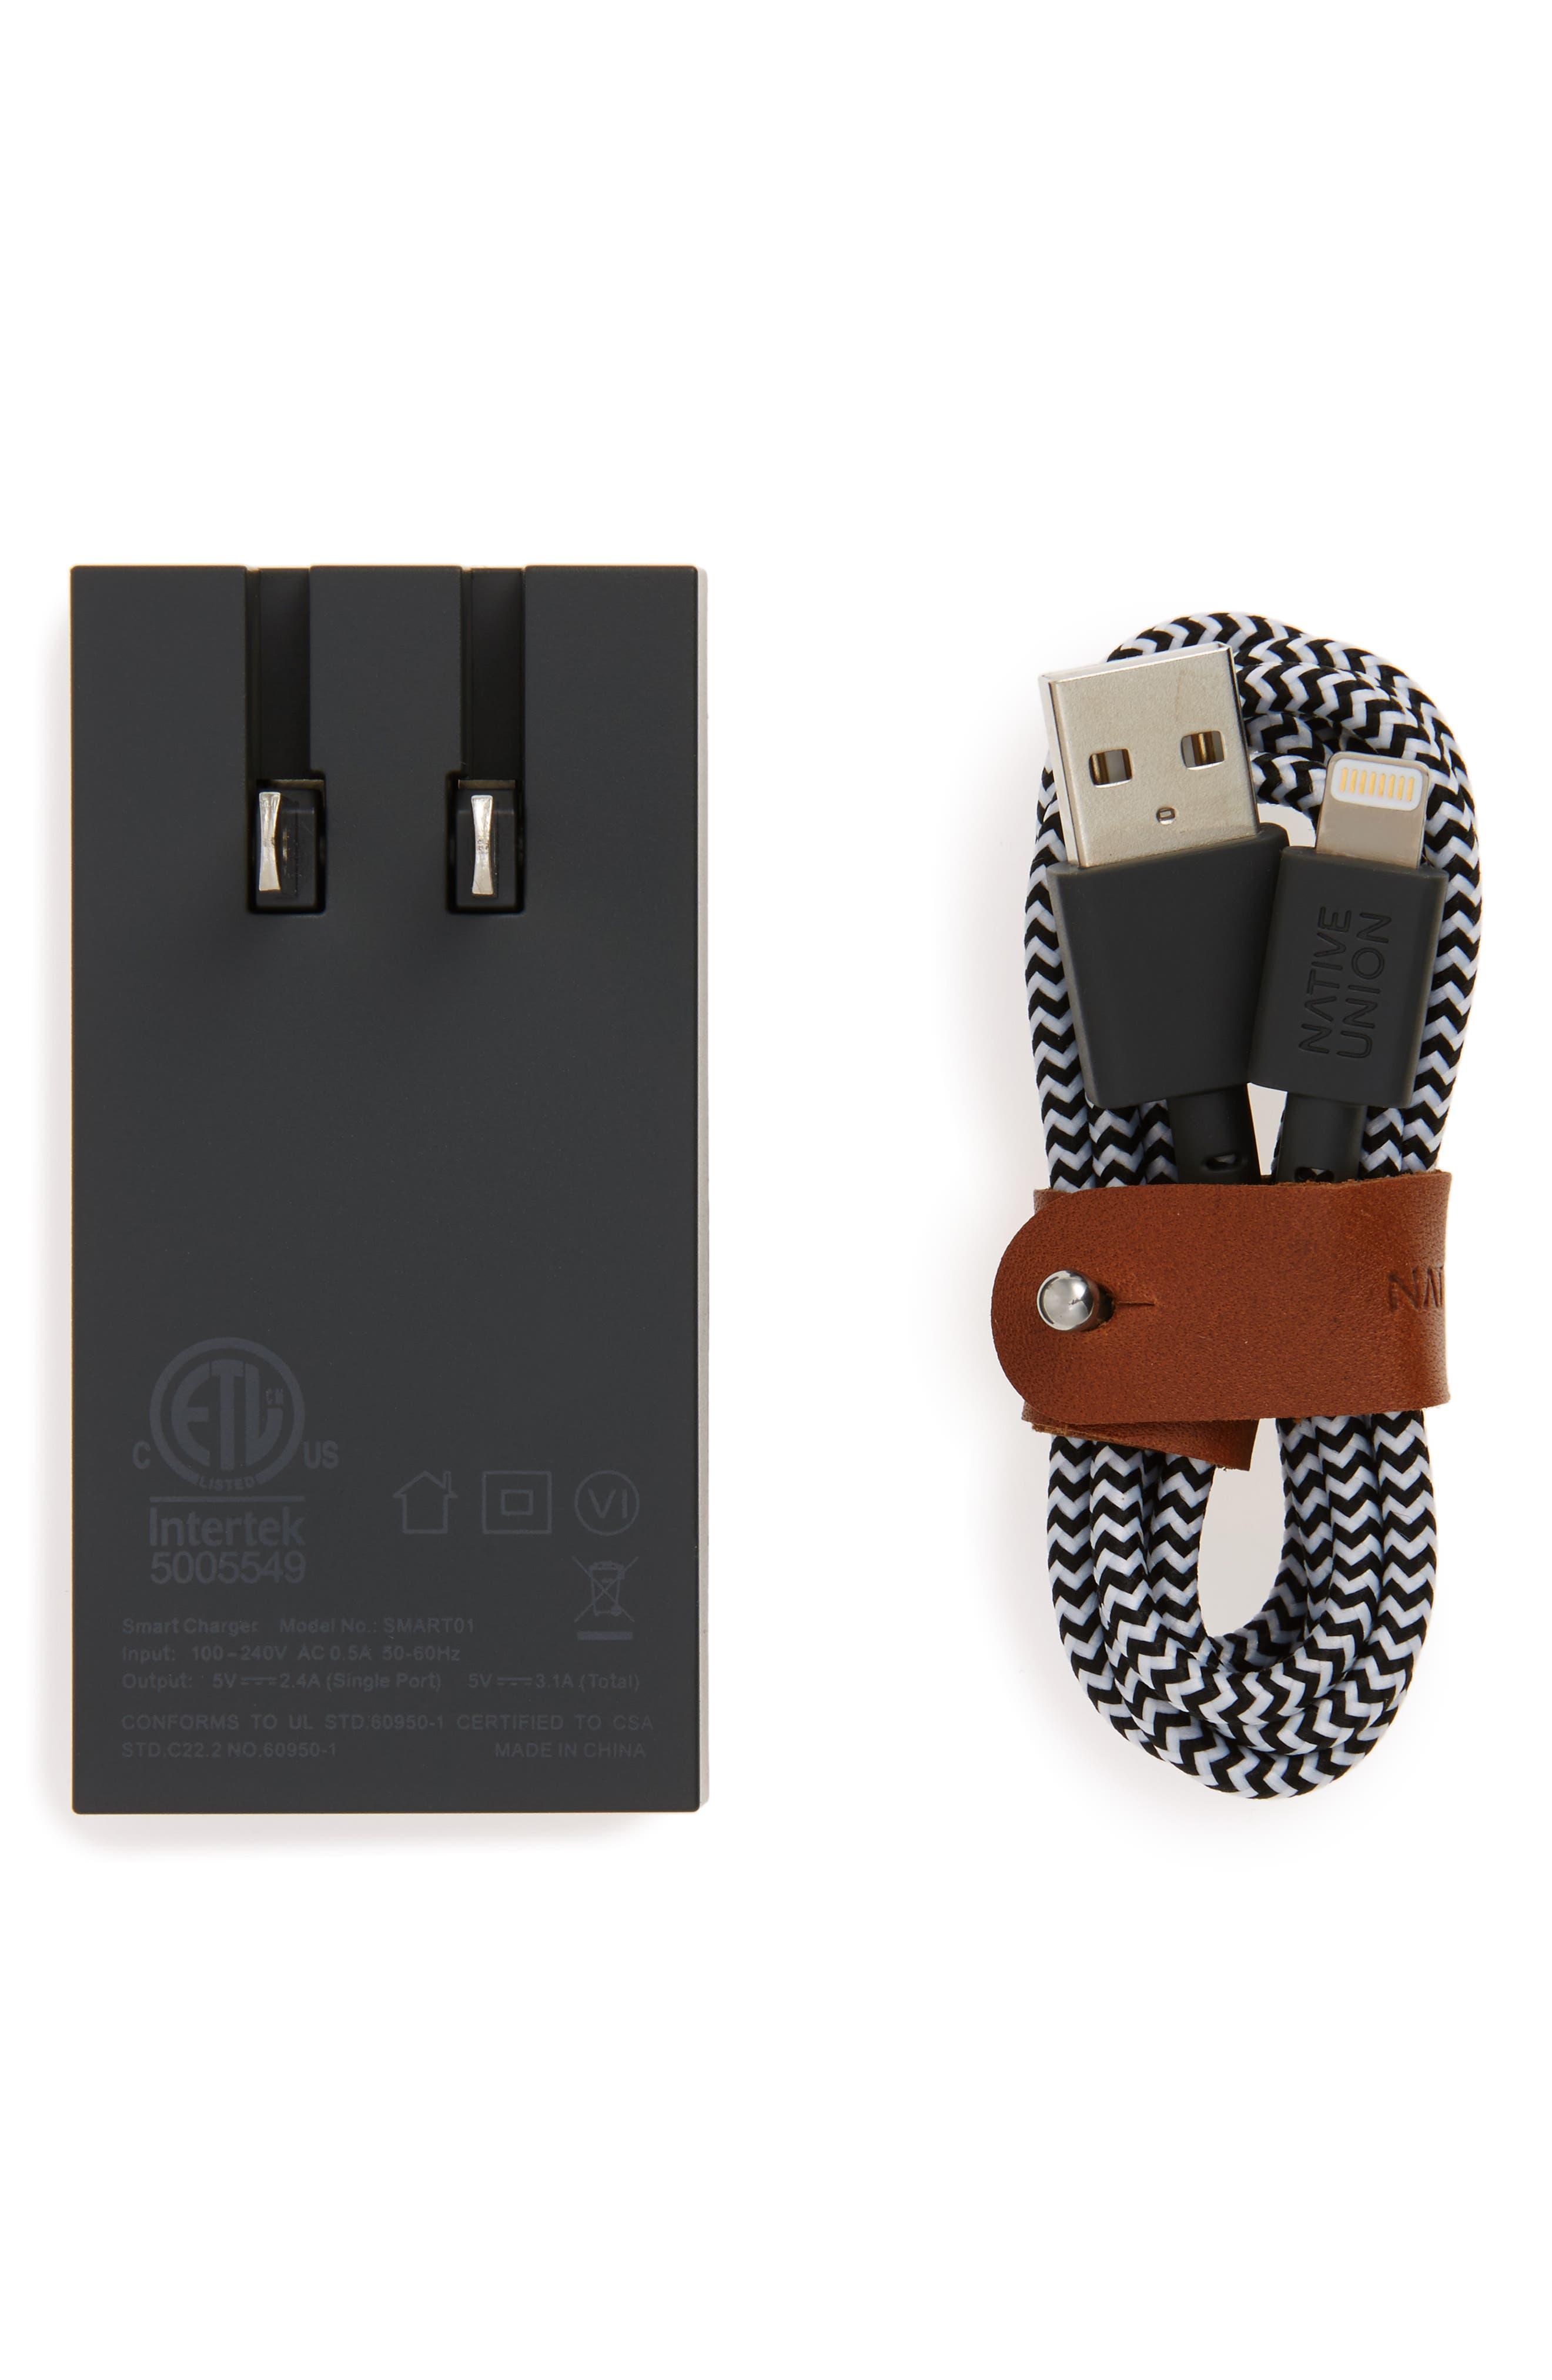 Main Image - Native Union Lightning Cable & 2-Port USB Charger Set